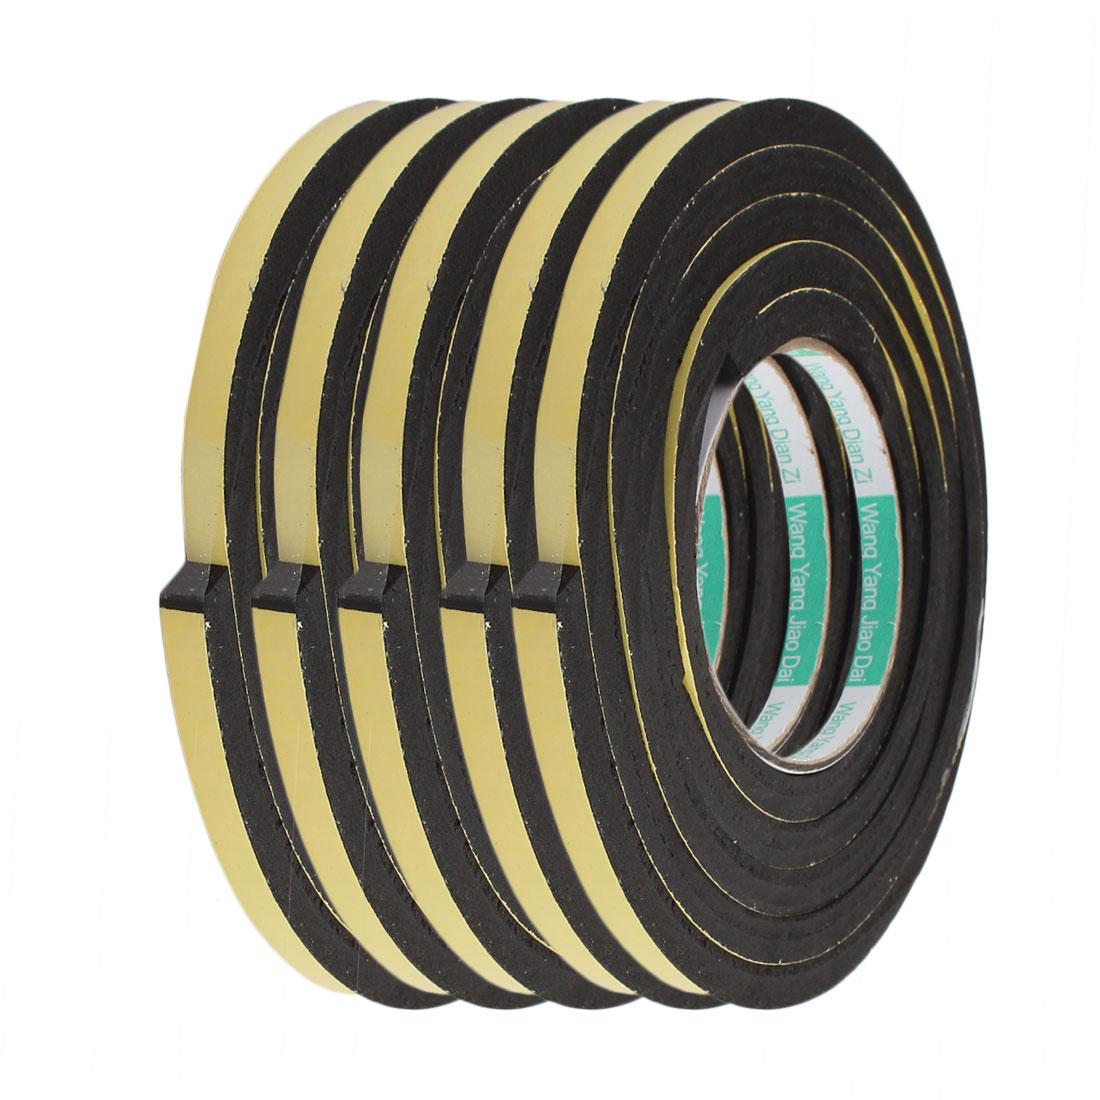 5pcs 2M 8mm x 8mm Single-side Adhesive Shockproof Sponge Foam Tape Yellow Black